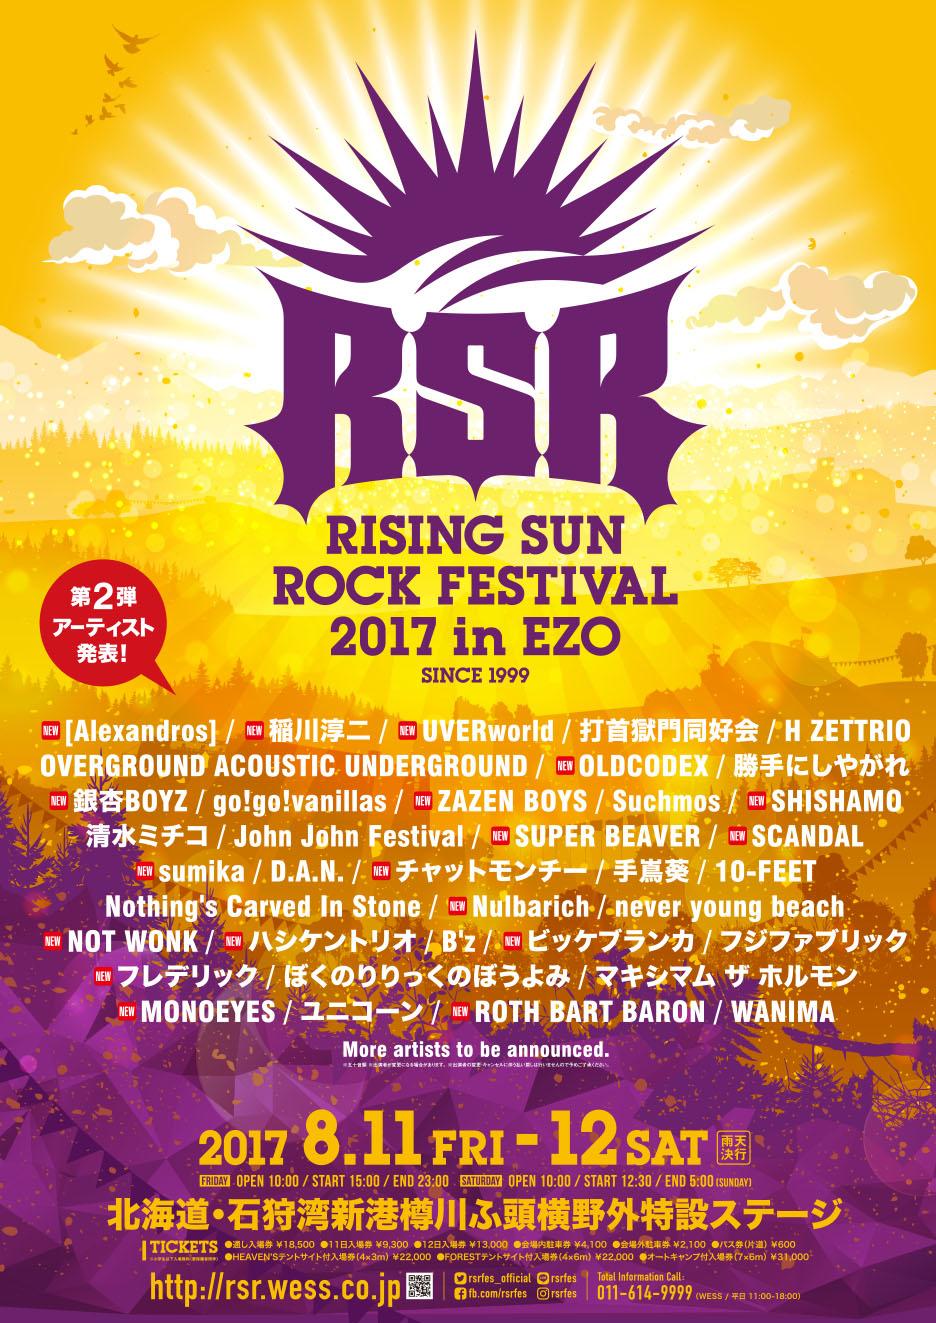 RISING SUN ROCK FESTIVAL 2017 in EZO 第2弾出演アーティスト発表!